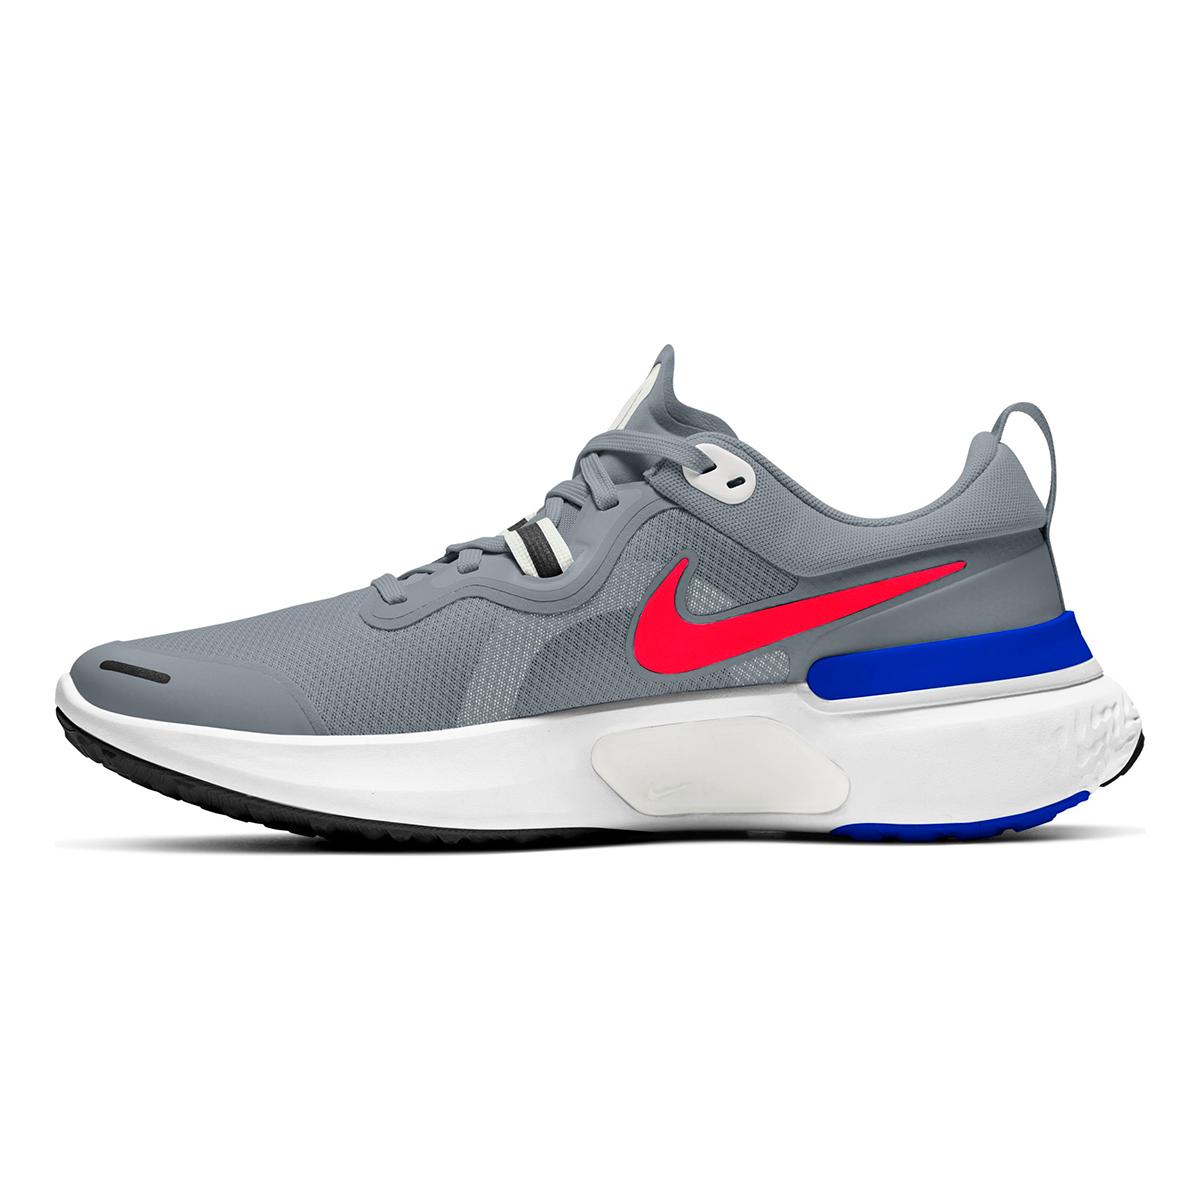 Men's Nike React Miler Running Shoe - Color: Pure Platinum/Racer Blue/Platinum Tint/Bright Crimson - Size: 6 - Width: Regular, Pure Platinum/Racer Blue/Platinum Tint/Bright Crimson, large, image 2